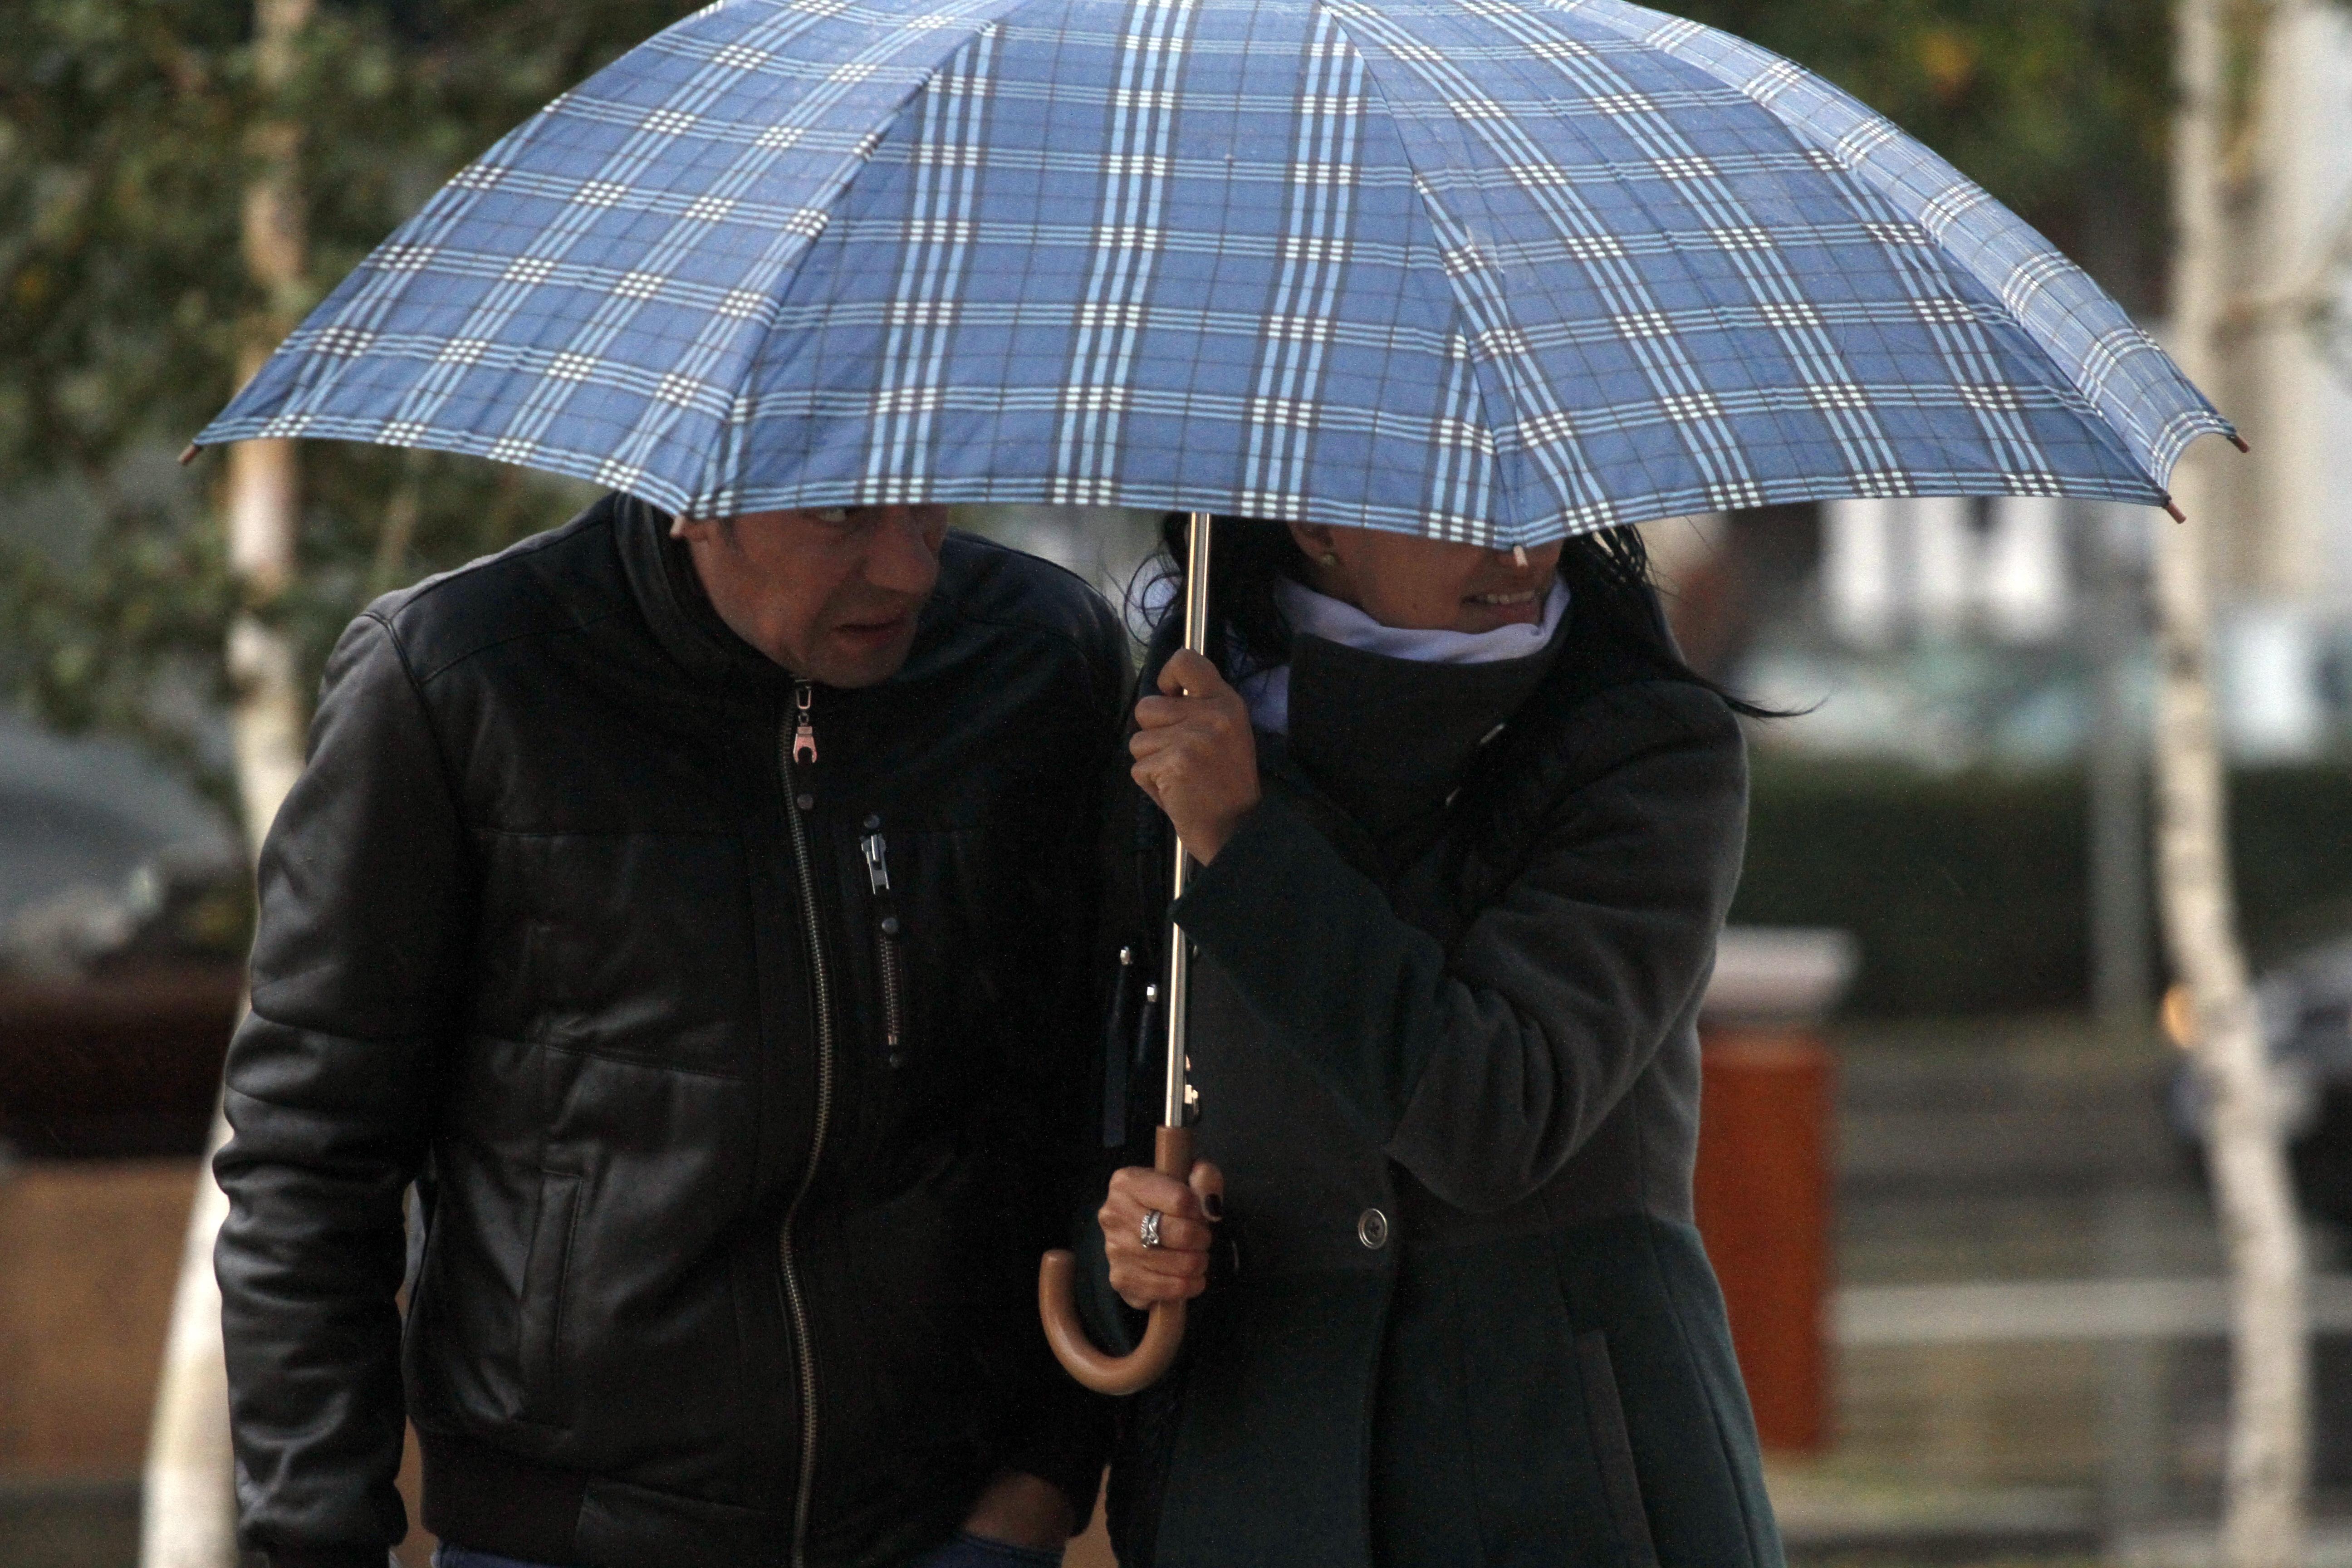 Romania trece la ora de vara cu o vreme mohorata si precipitatii in toata tara. Cand se opresc ploile